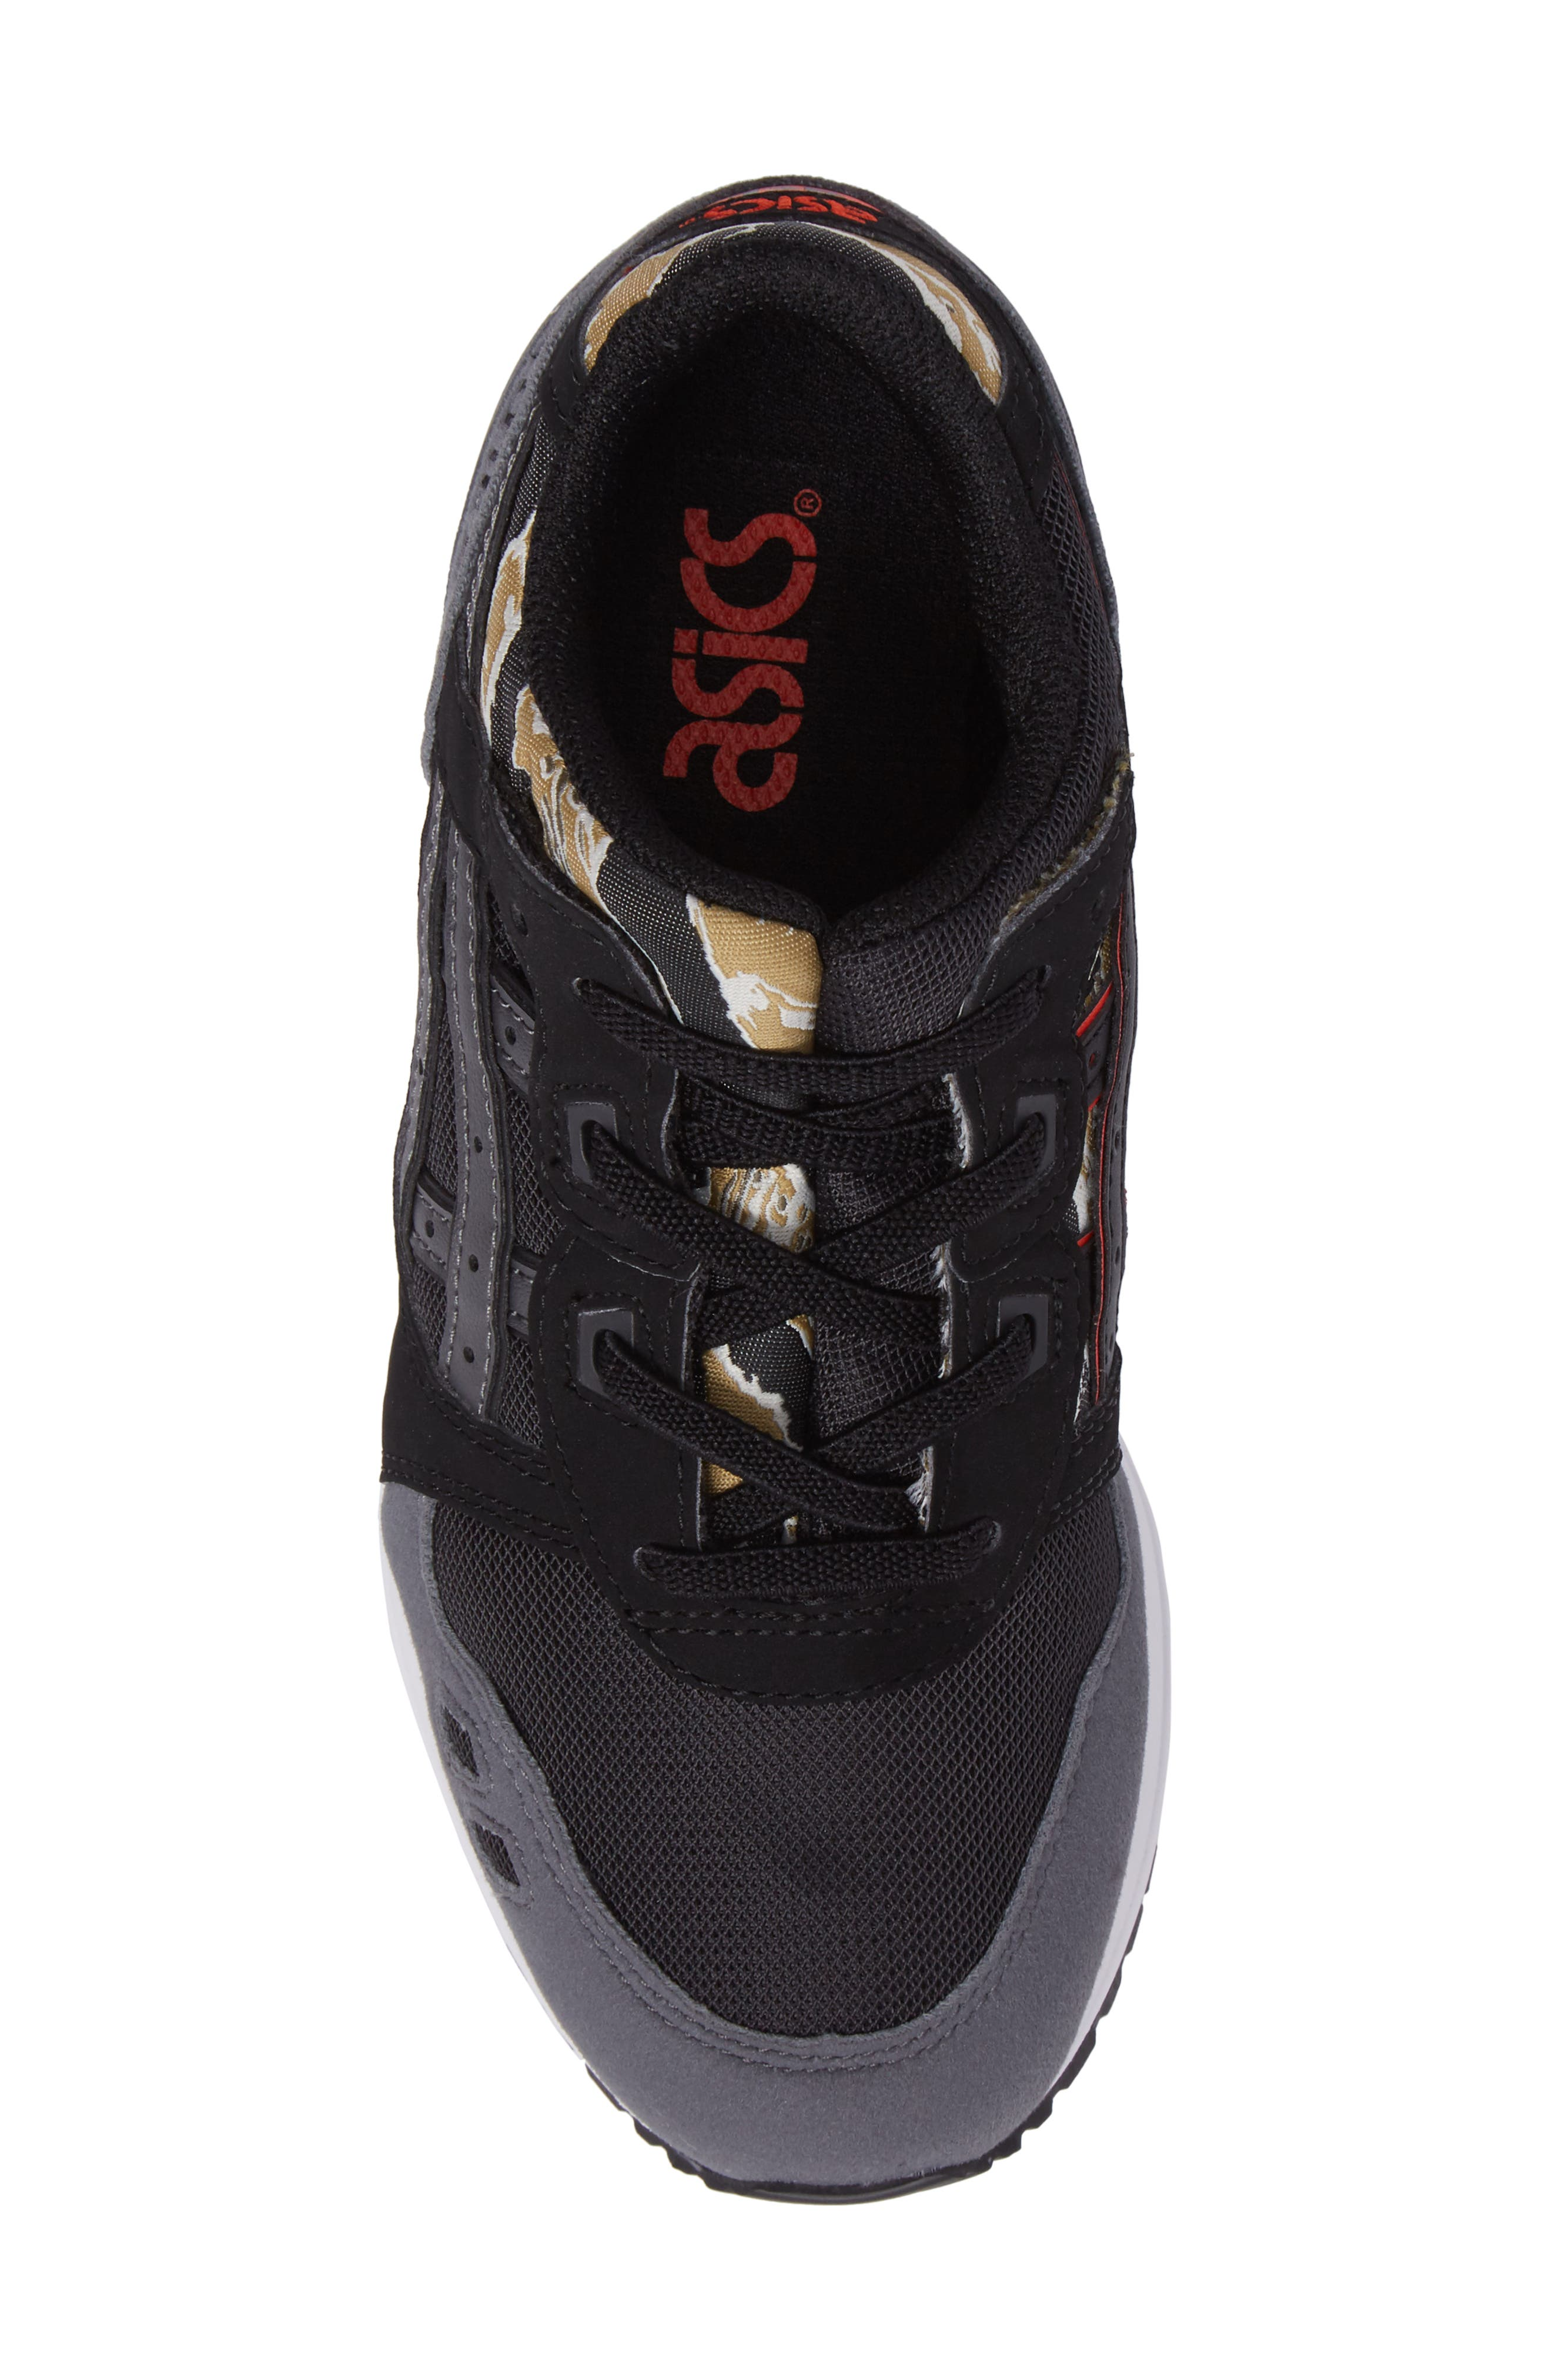 GEL-LYTE<sup>®</sup> III PS Slip-On Sneaker,                             Alternate thumbnail 5, color,                             001